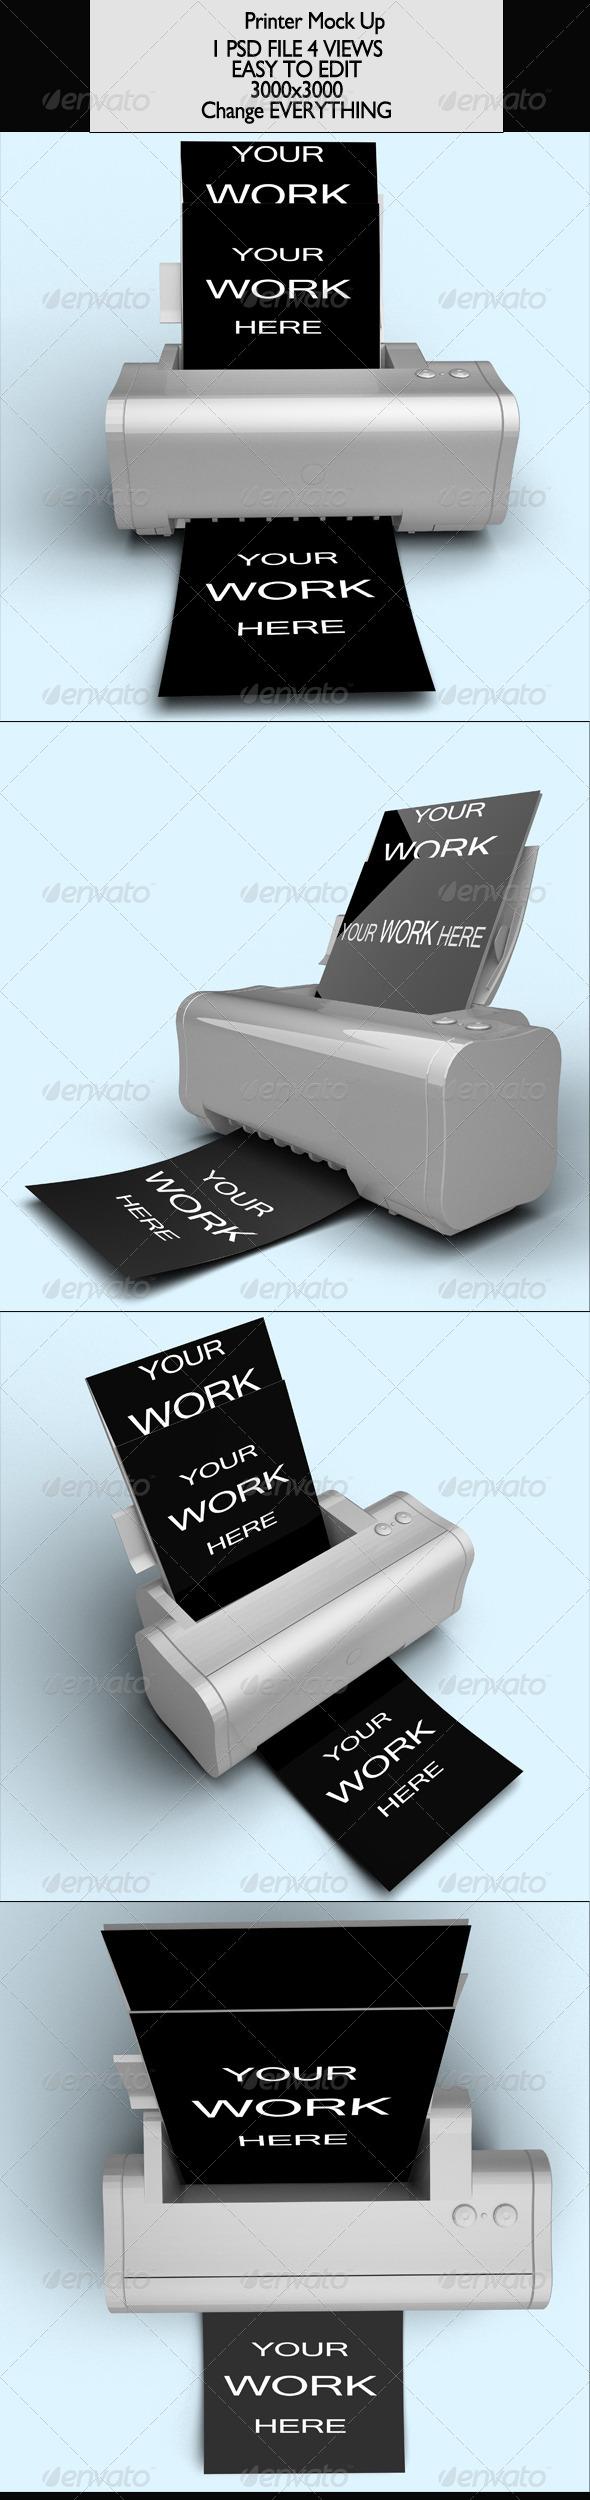 GraphicRiver Printer Vol 1 Mock-Up 7048275